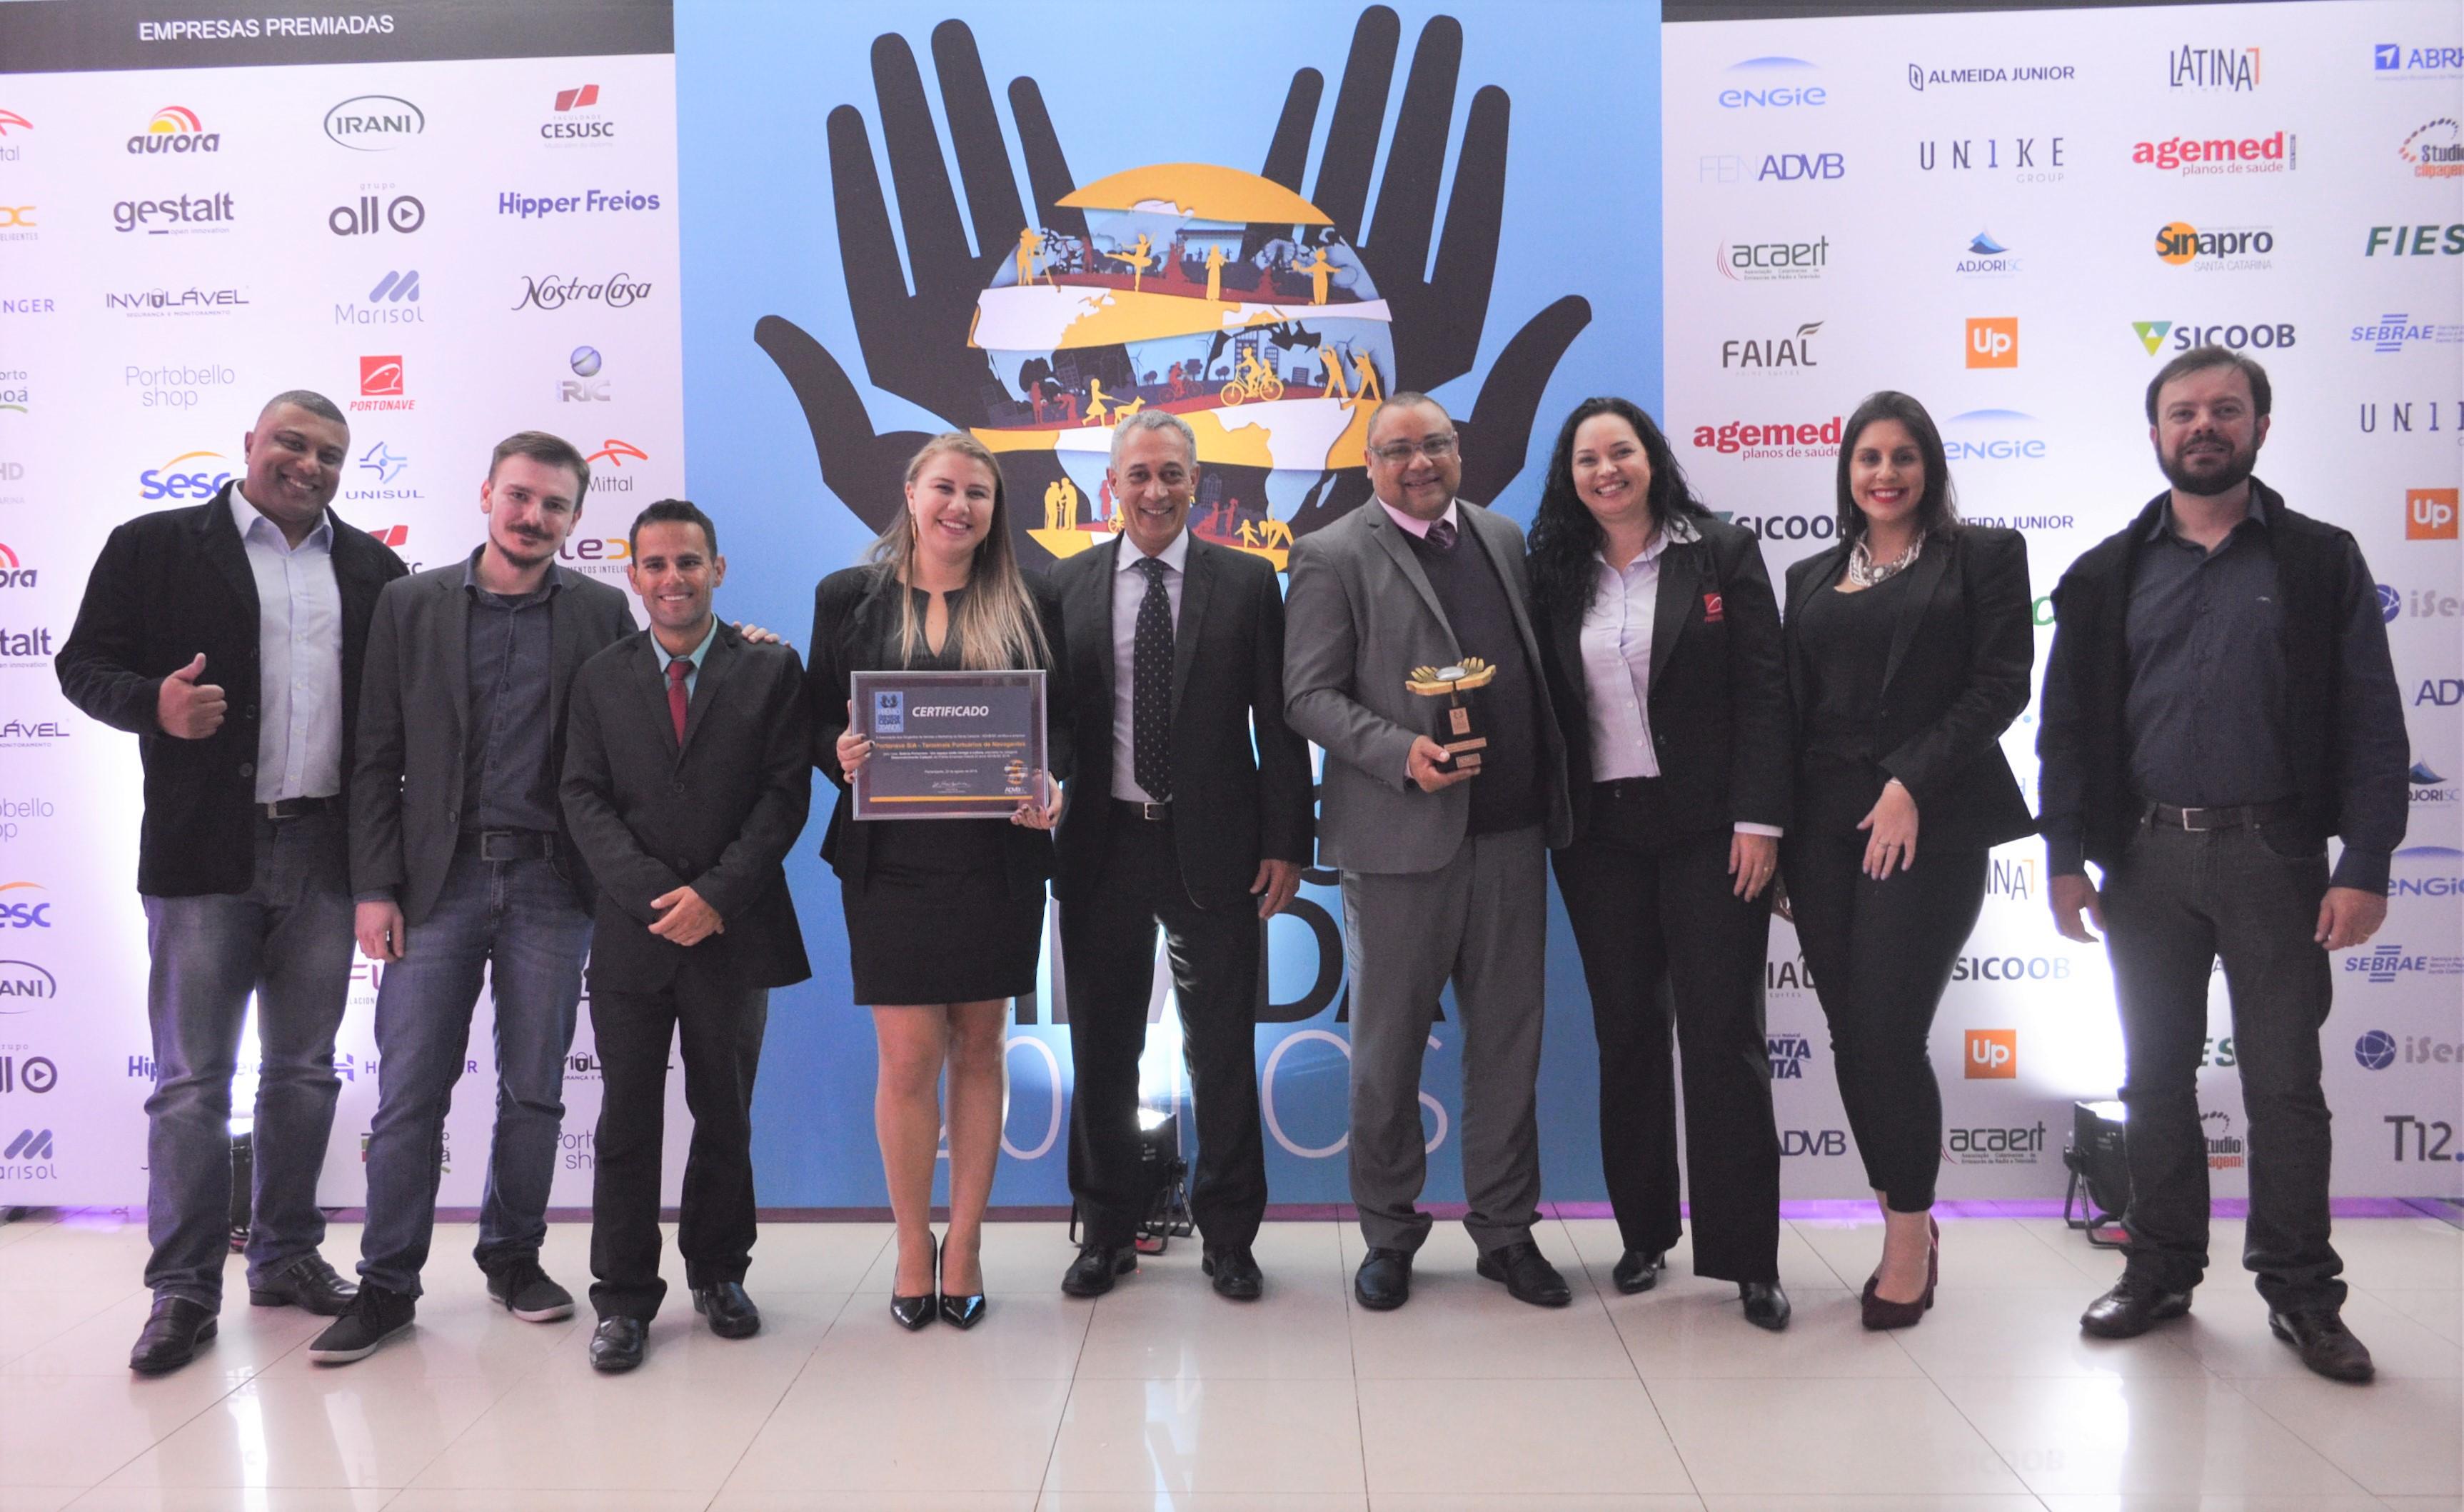 Prêmio Empresa Cidadã profissionais